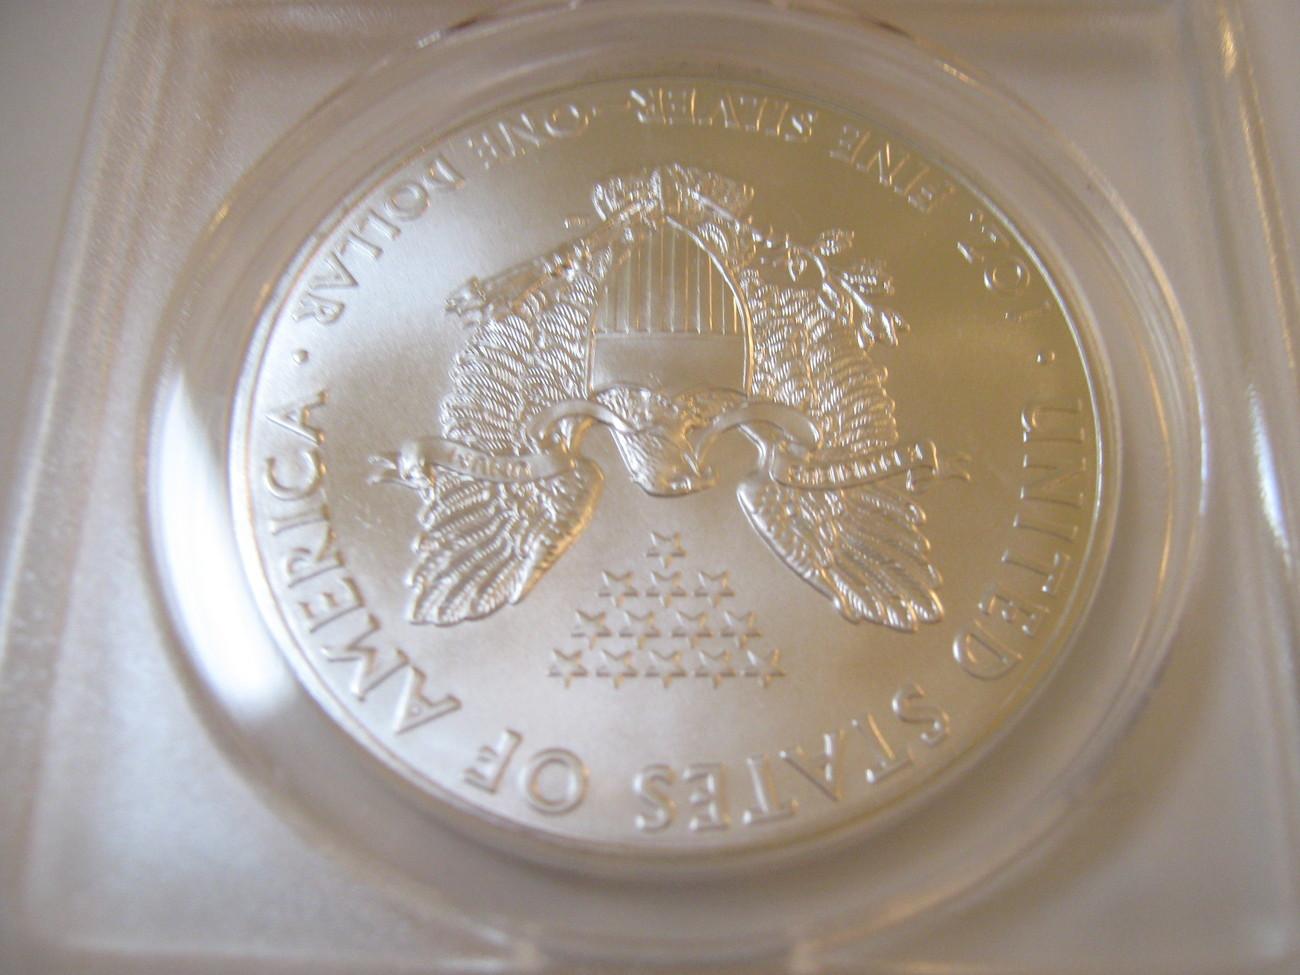 2012 Silver Eagle , ANACS , MS 69 image 3